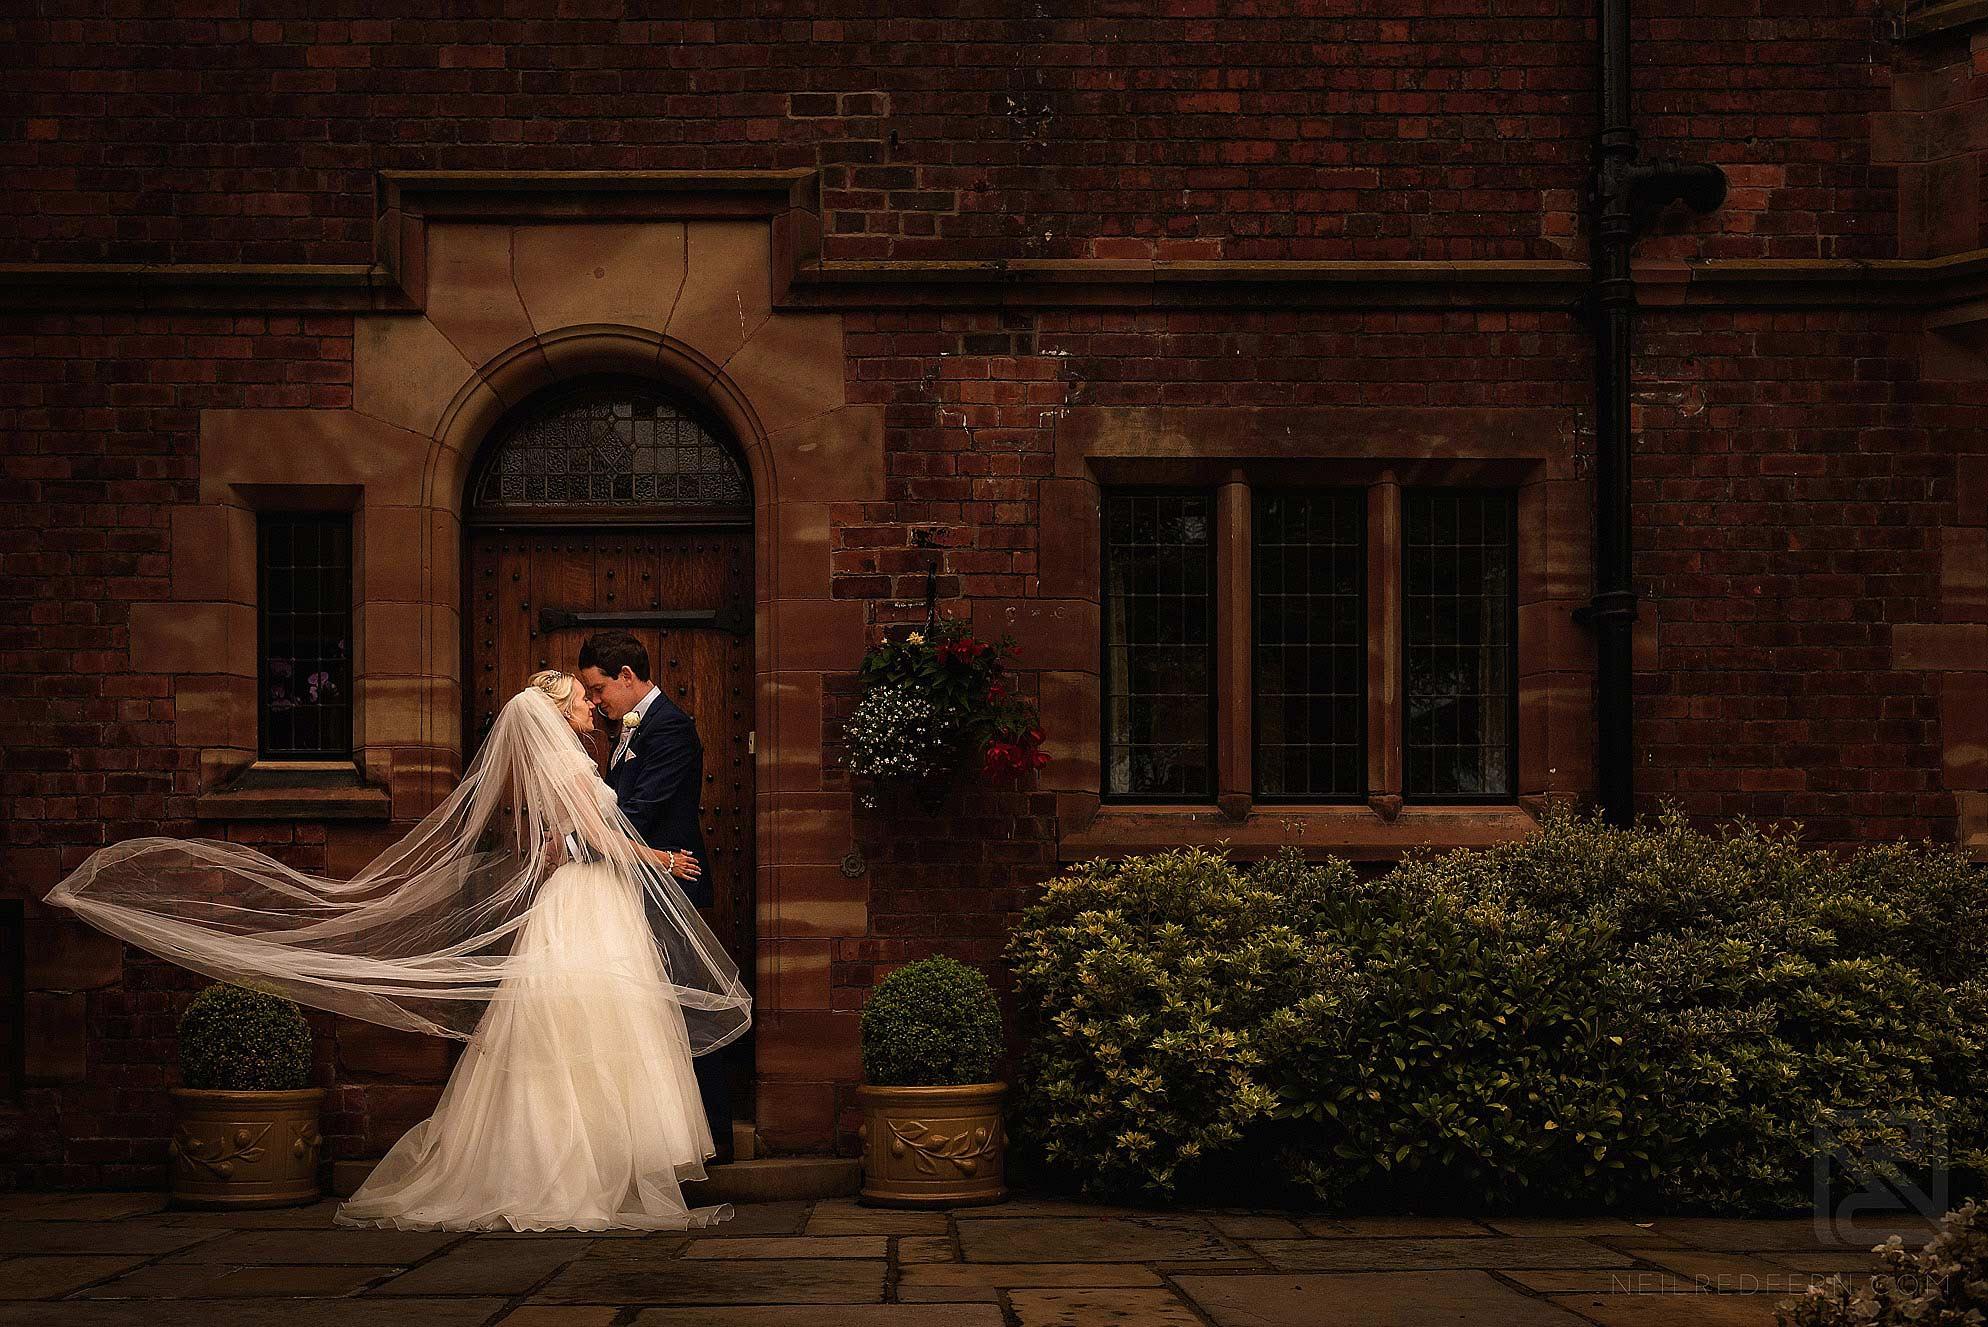 colshaw-hall-wedding-photographs-36